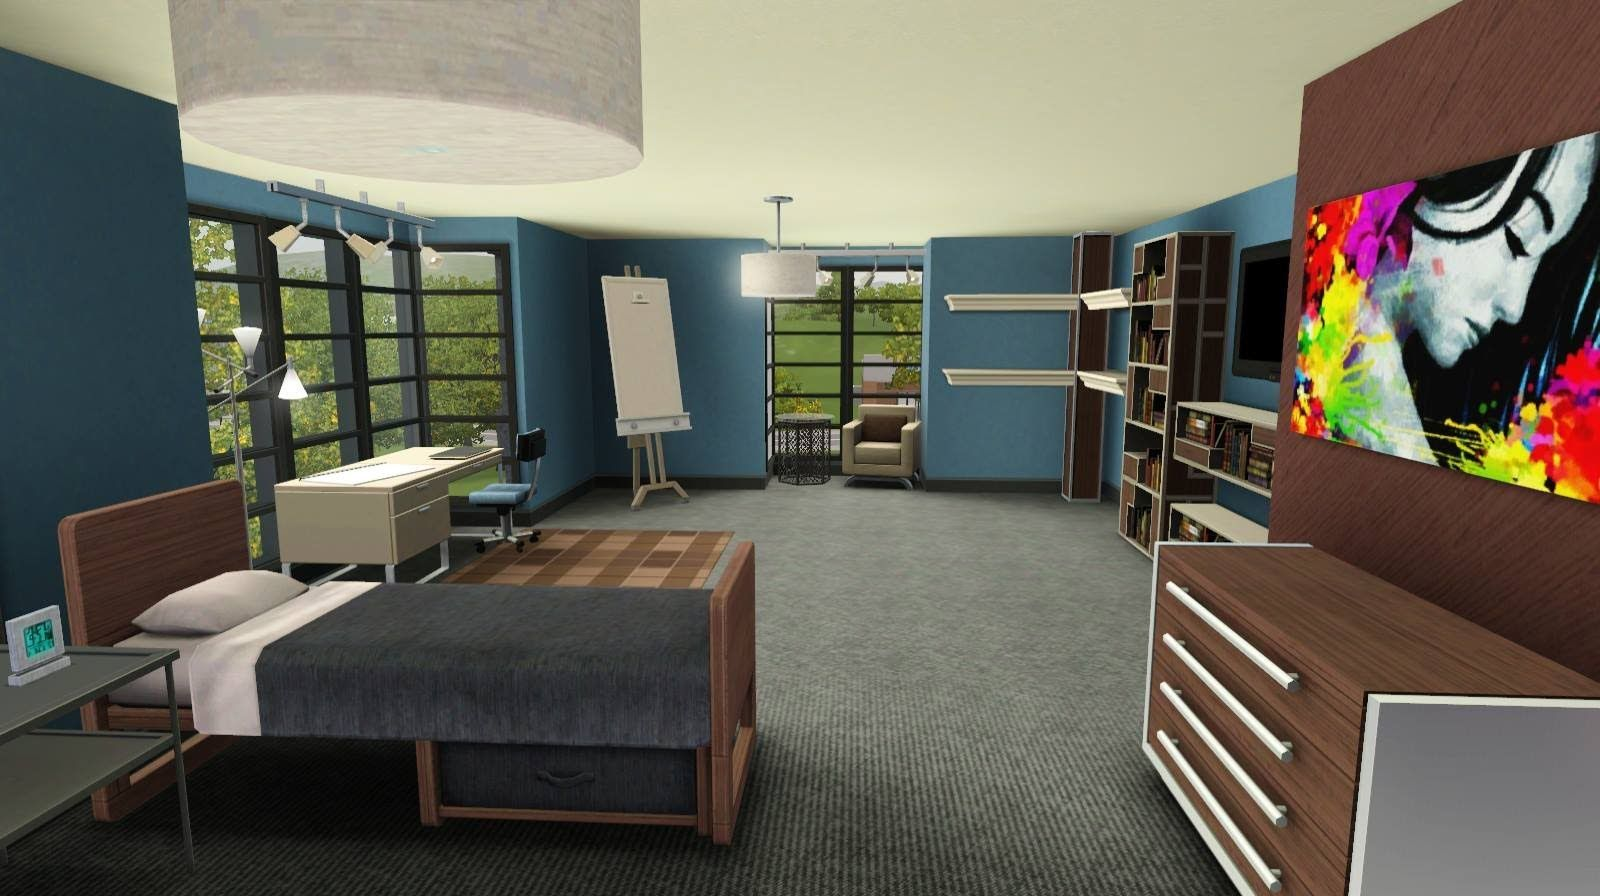 Decorating Ideas > Sims 3  Building Wright Hall Dormitory  Sims 3 CC  ~ 164505_Sims 3 Dorm Room Ideas